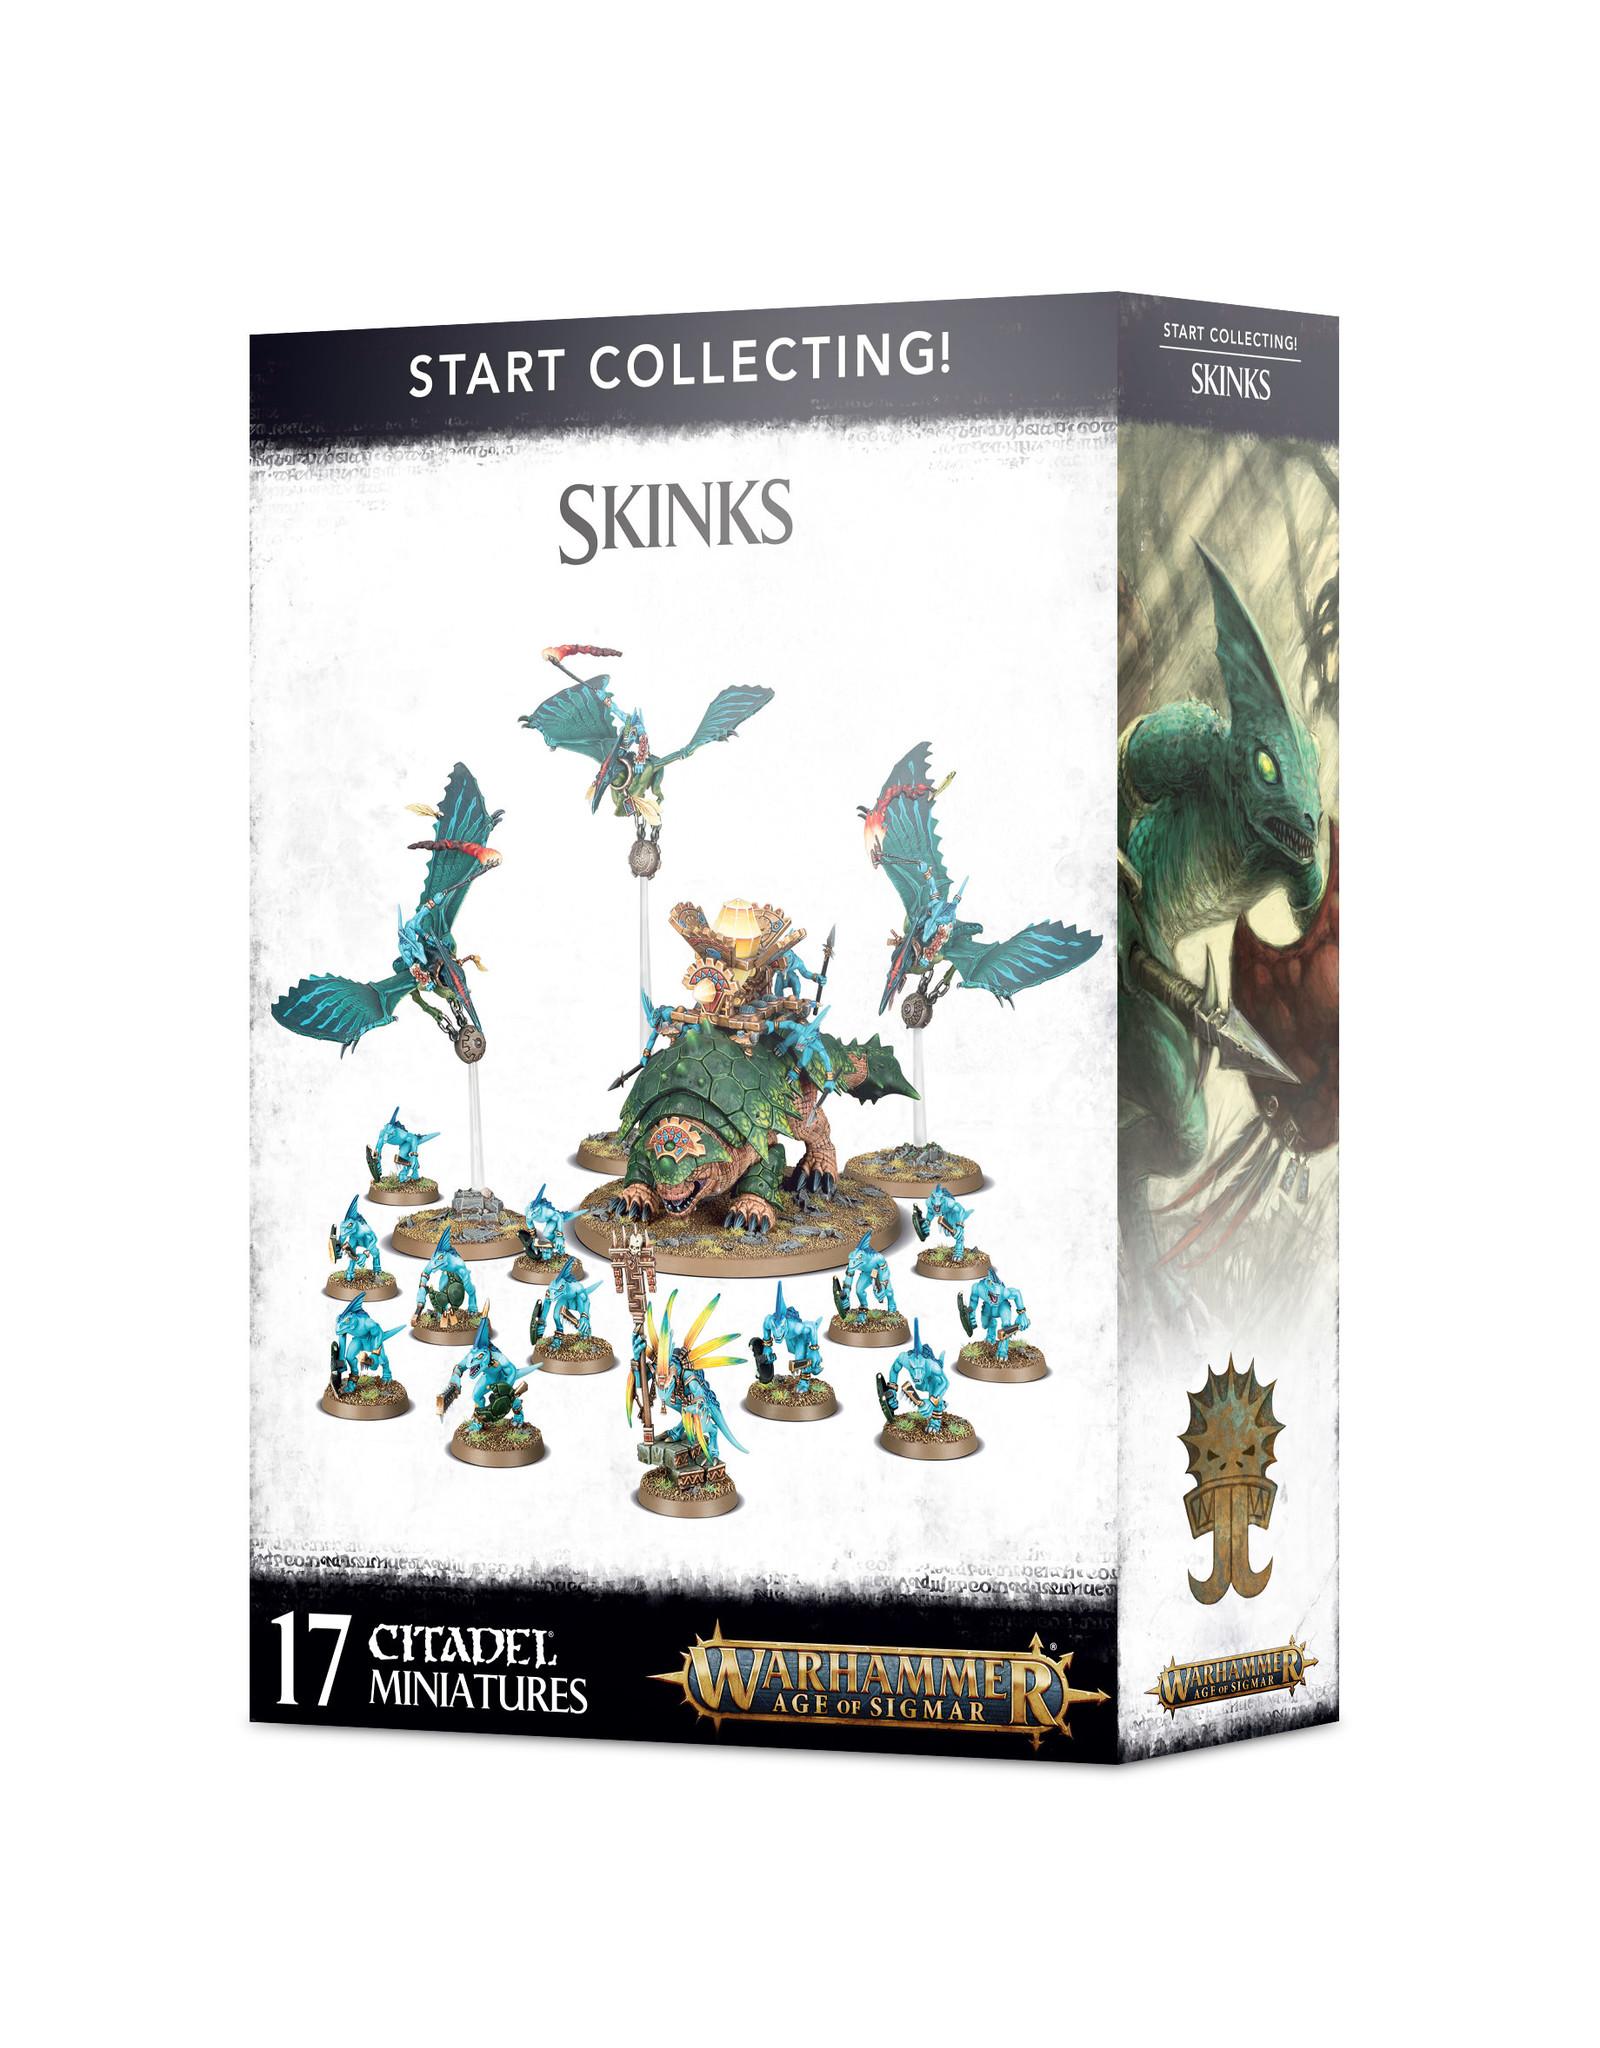 Games-Workshop START COLLECTING! SKINKS